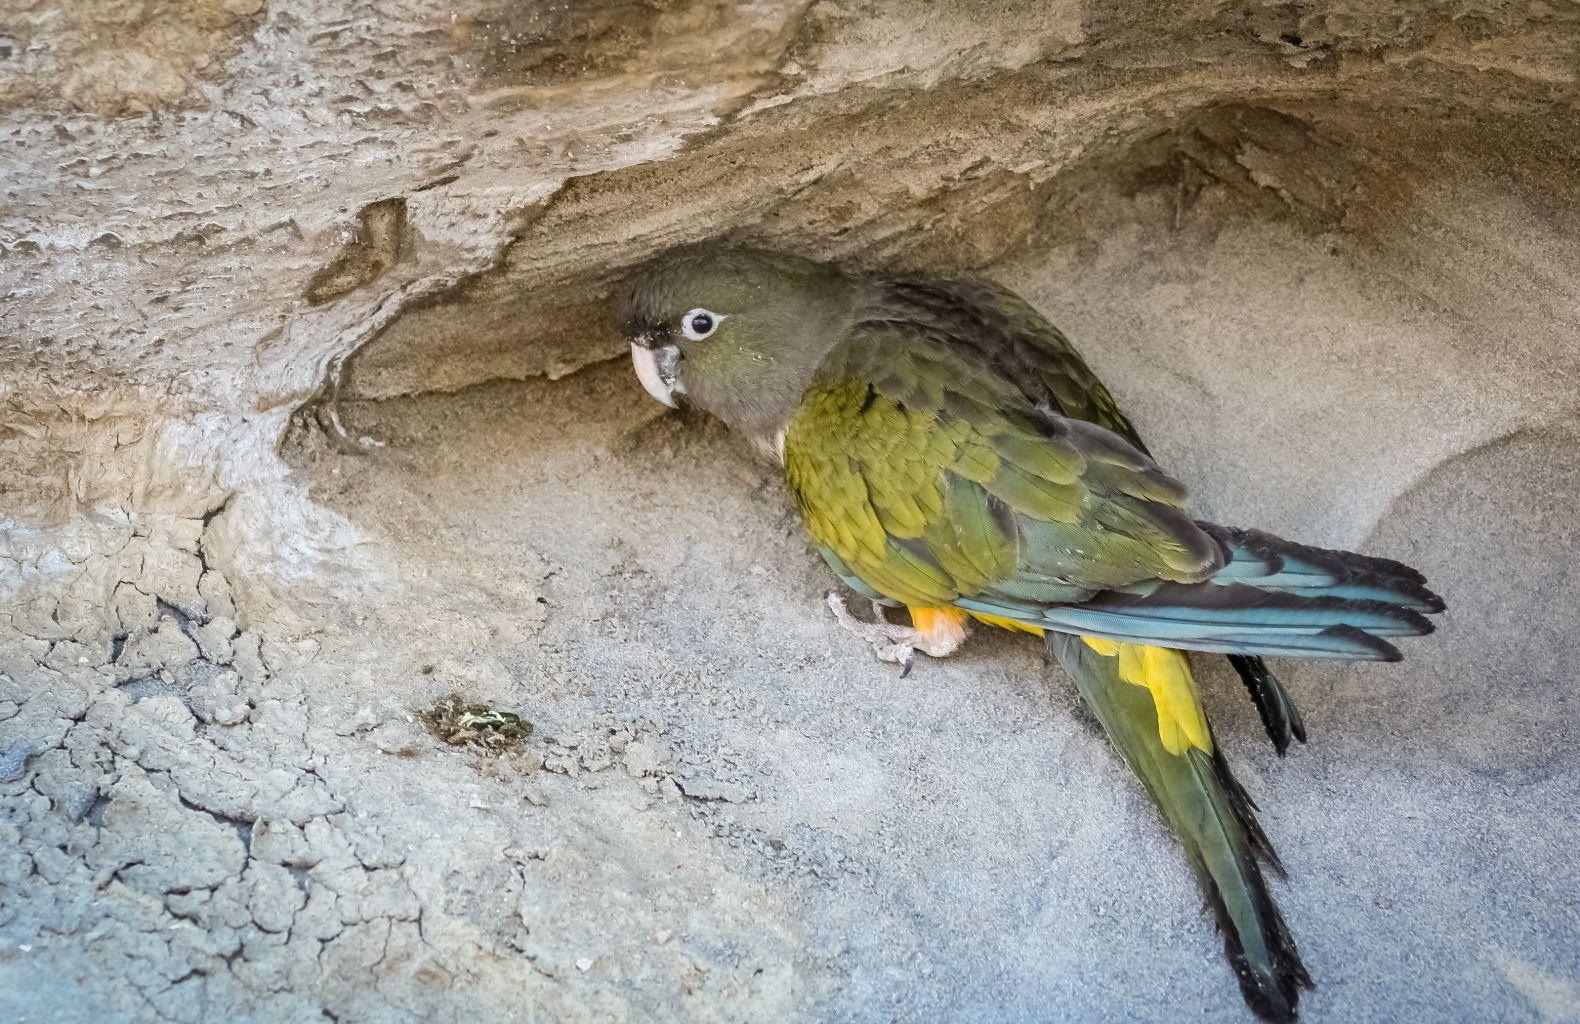 la cotorra argentina es un ave exótica invasora